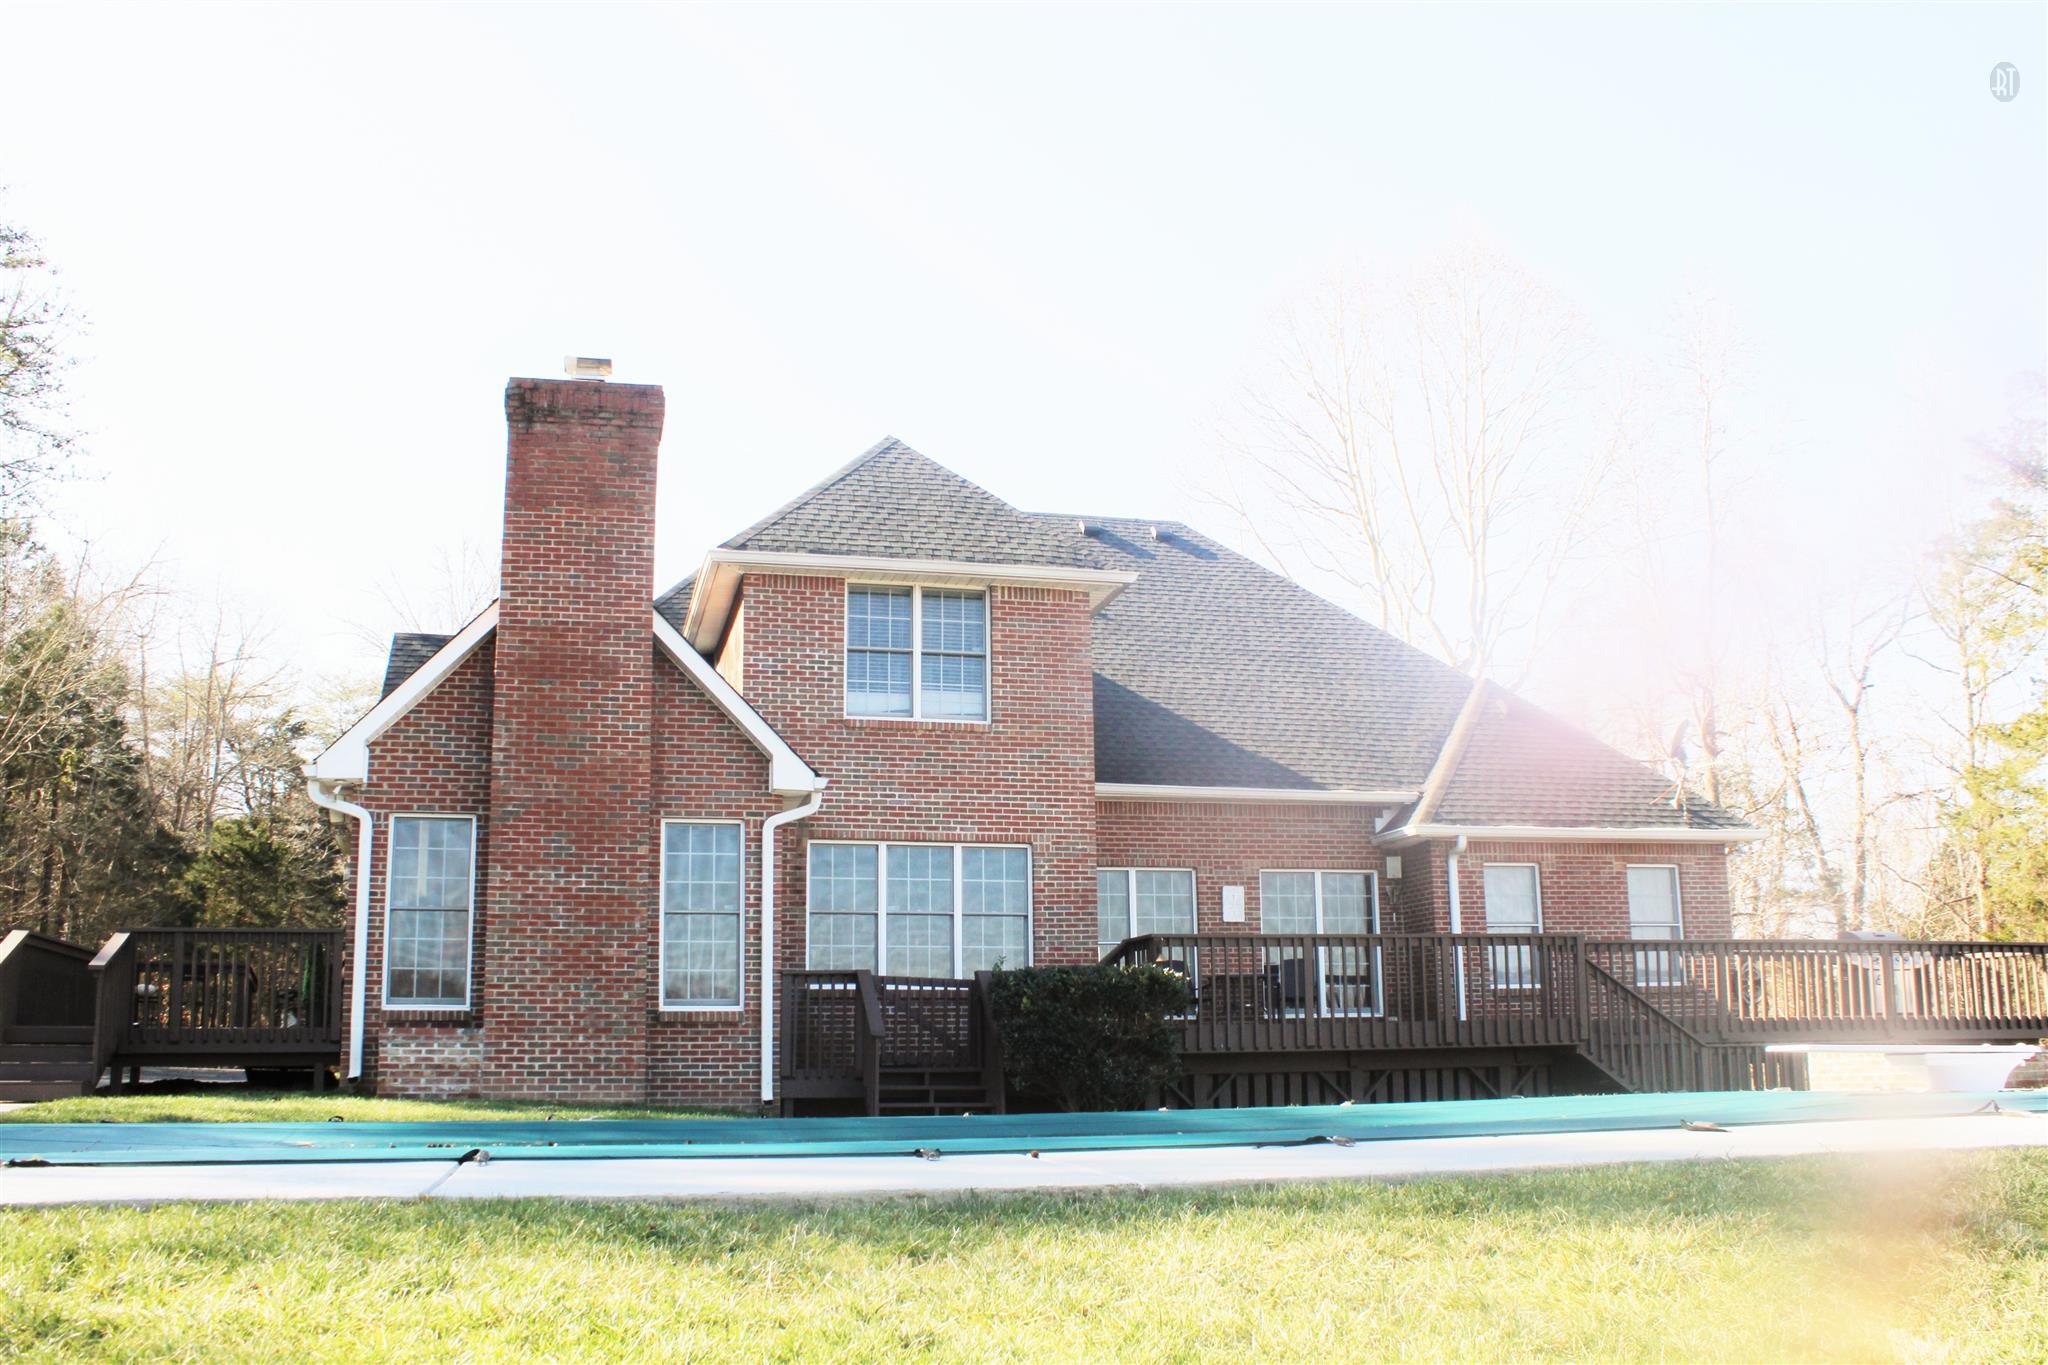 Real Estate for Sale, ListingId: 36949386, Kingston Springs,TN37082